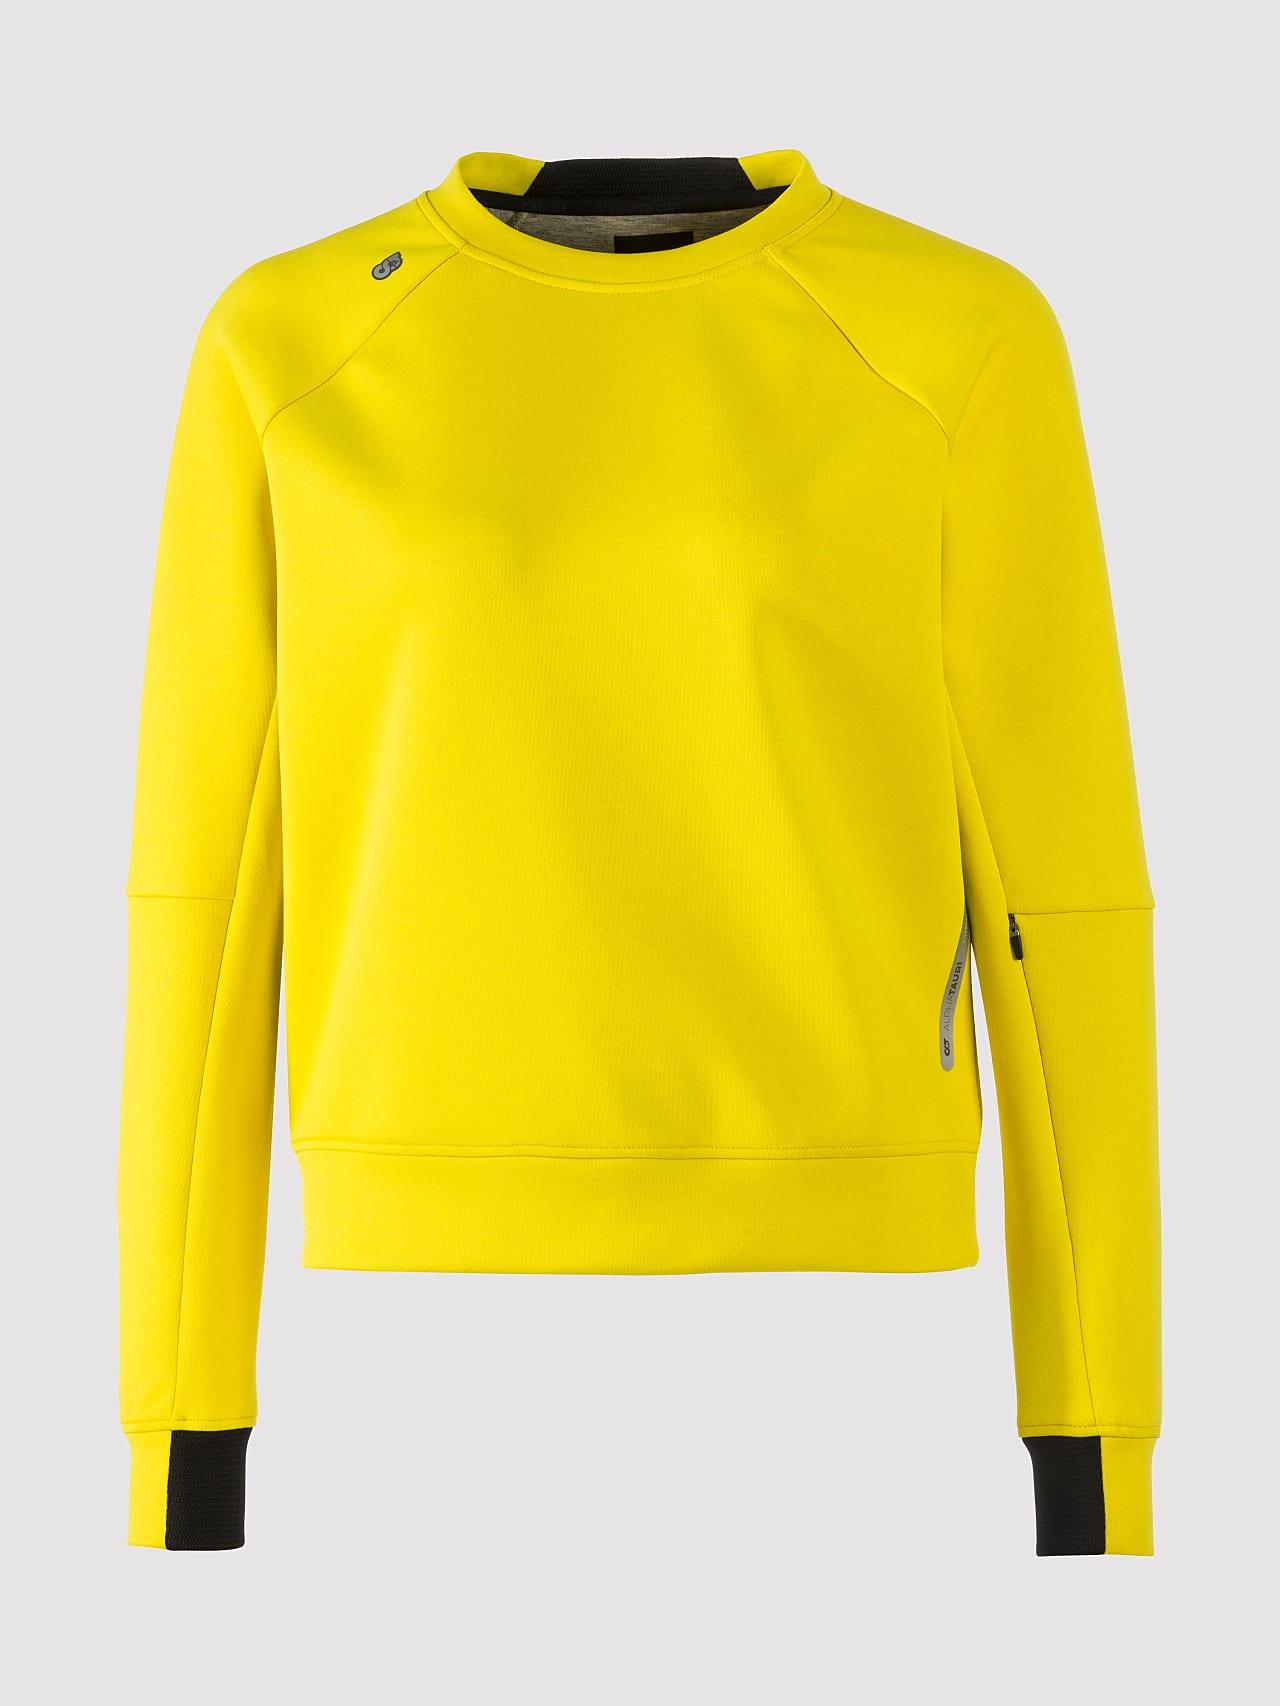 SINOV V1.Y5.01 Crewneck Sweater yellow Back Alpha Tauri